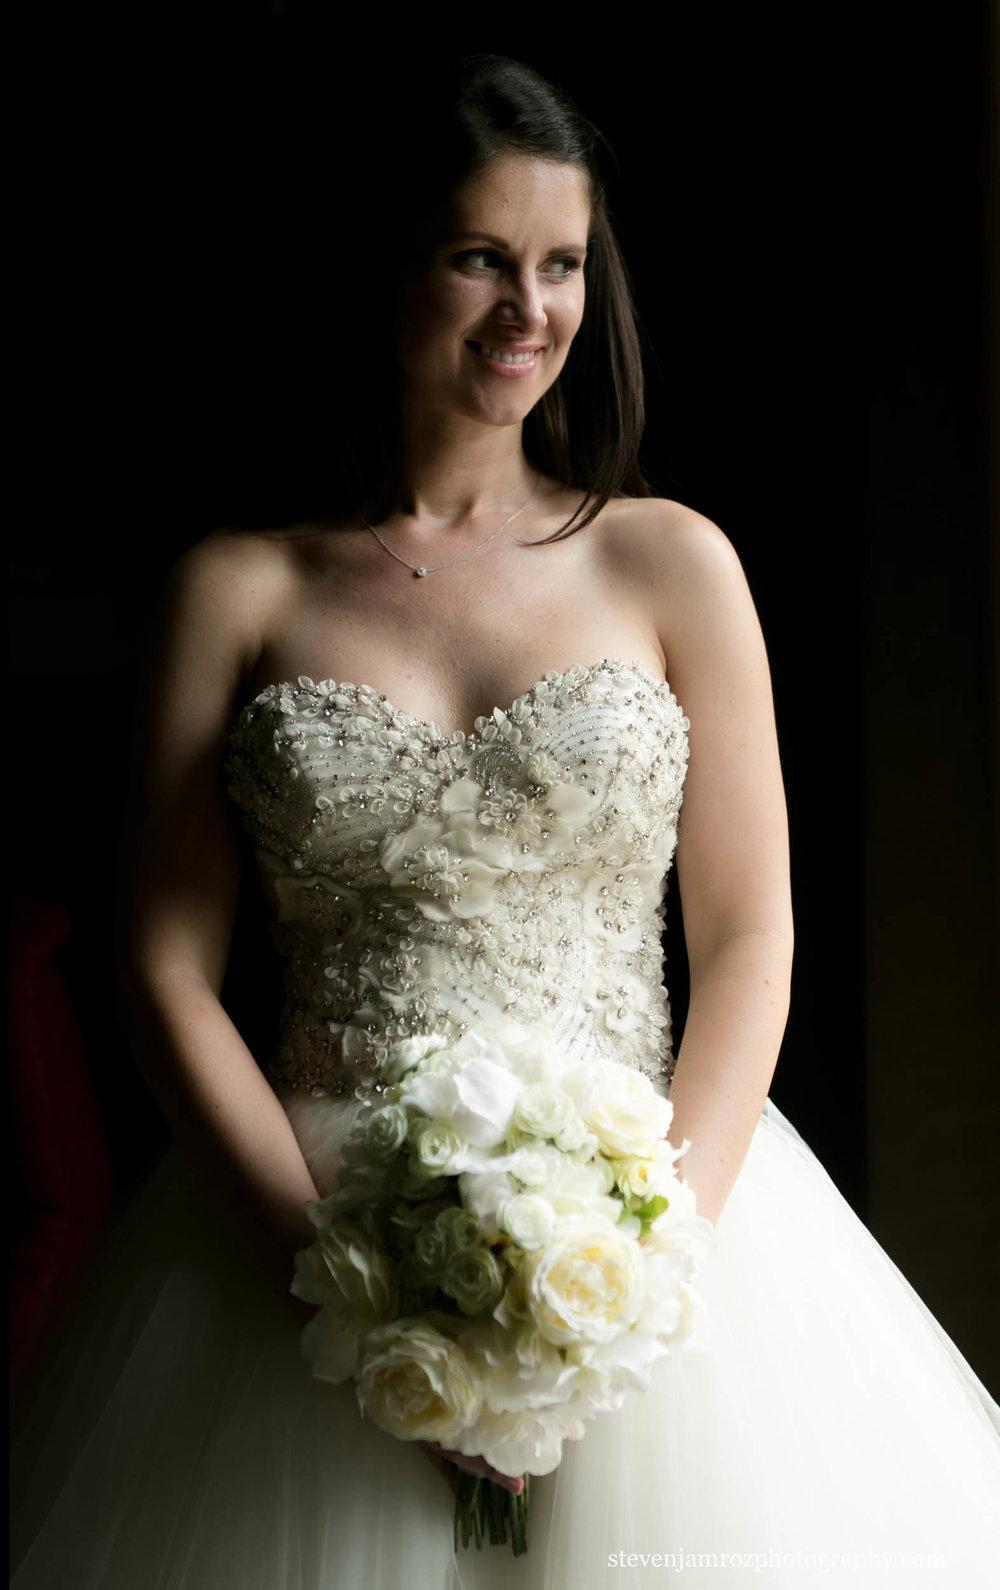 yellow-white-flowers-bride-portrait-wedding-steven-jamroz-0742.jpg